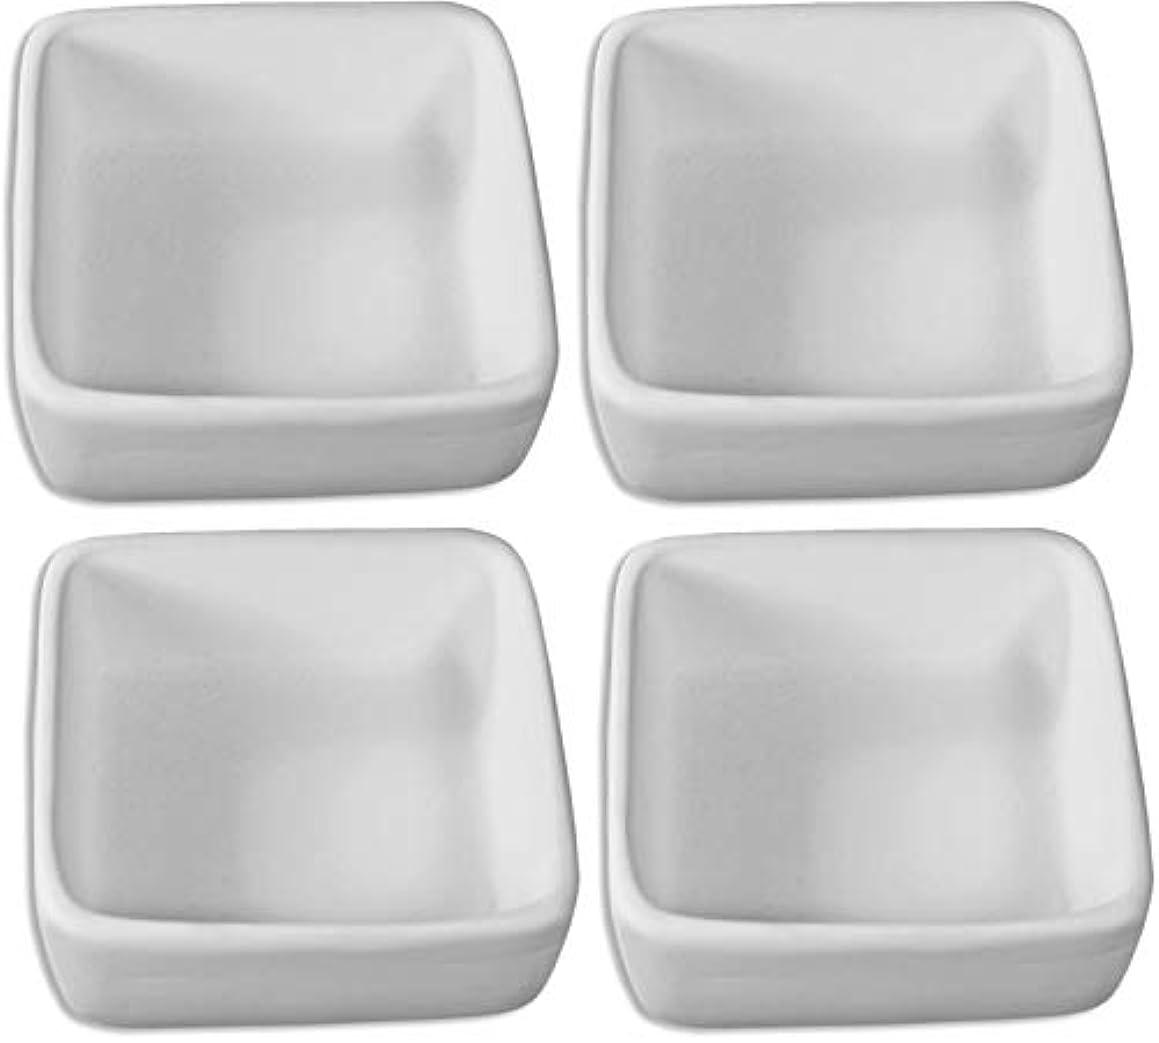 Tea Party Tart Dish - Set of 4 - Paint Your Own Ceramic Keepsake